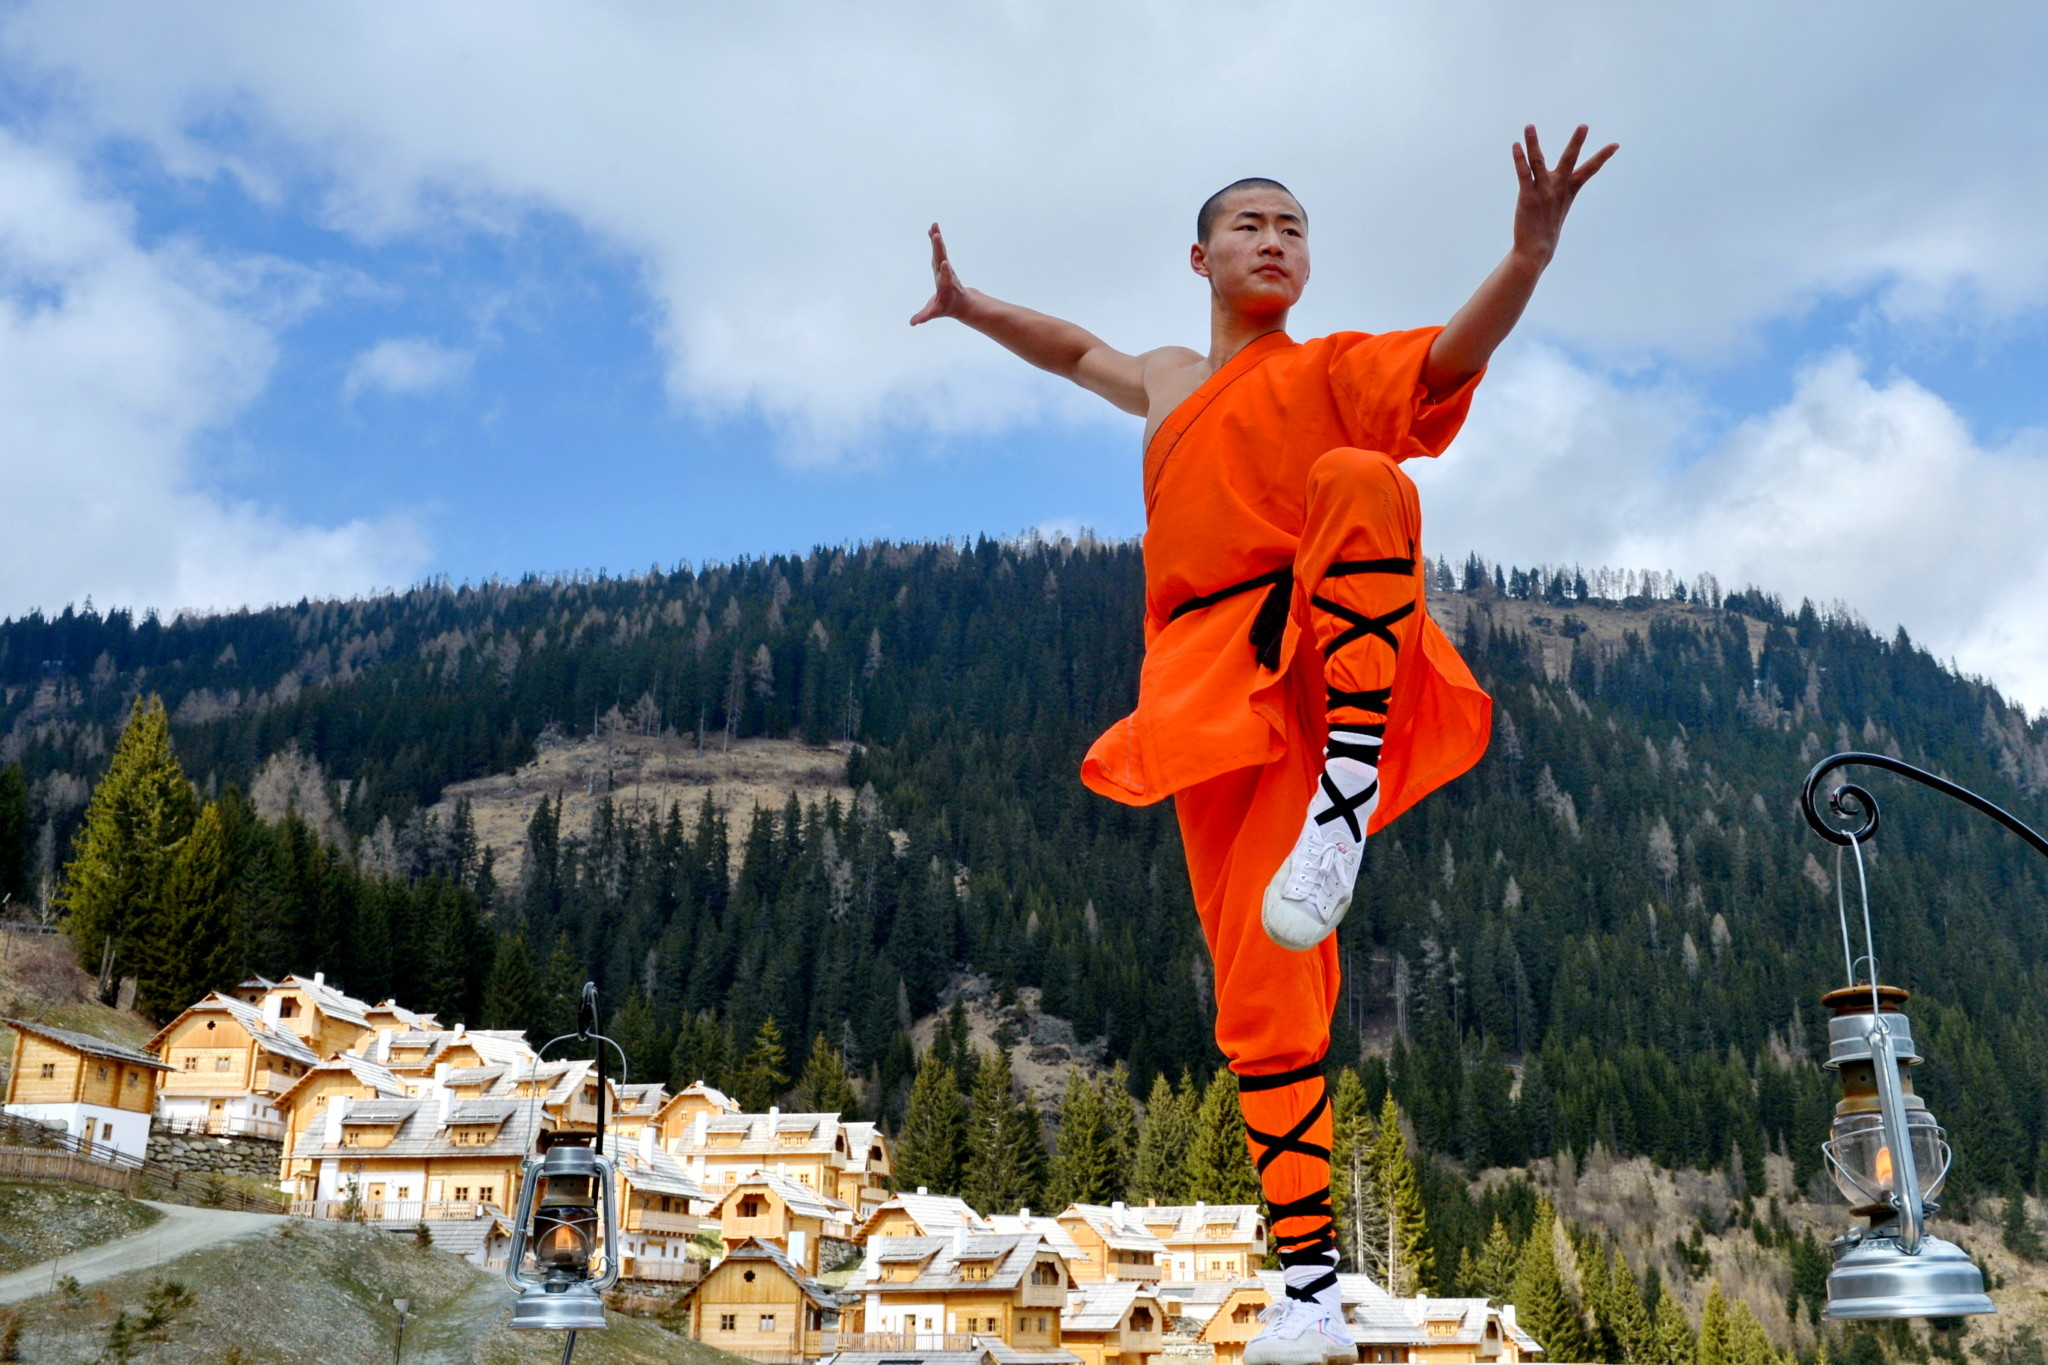 Shaolin Moenche_0195